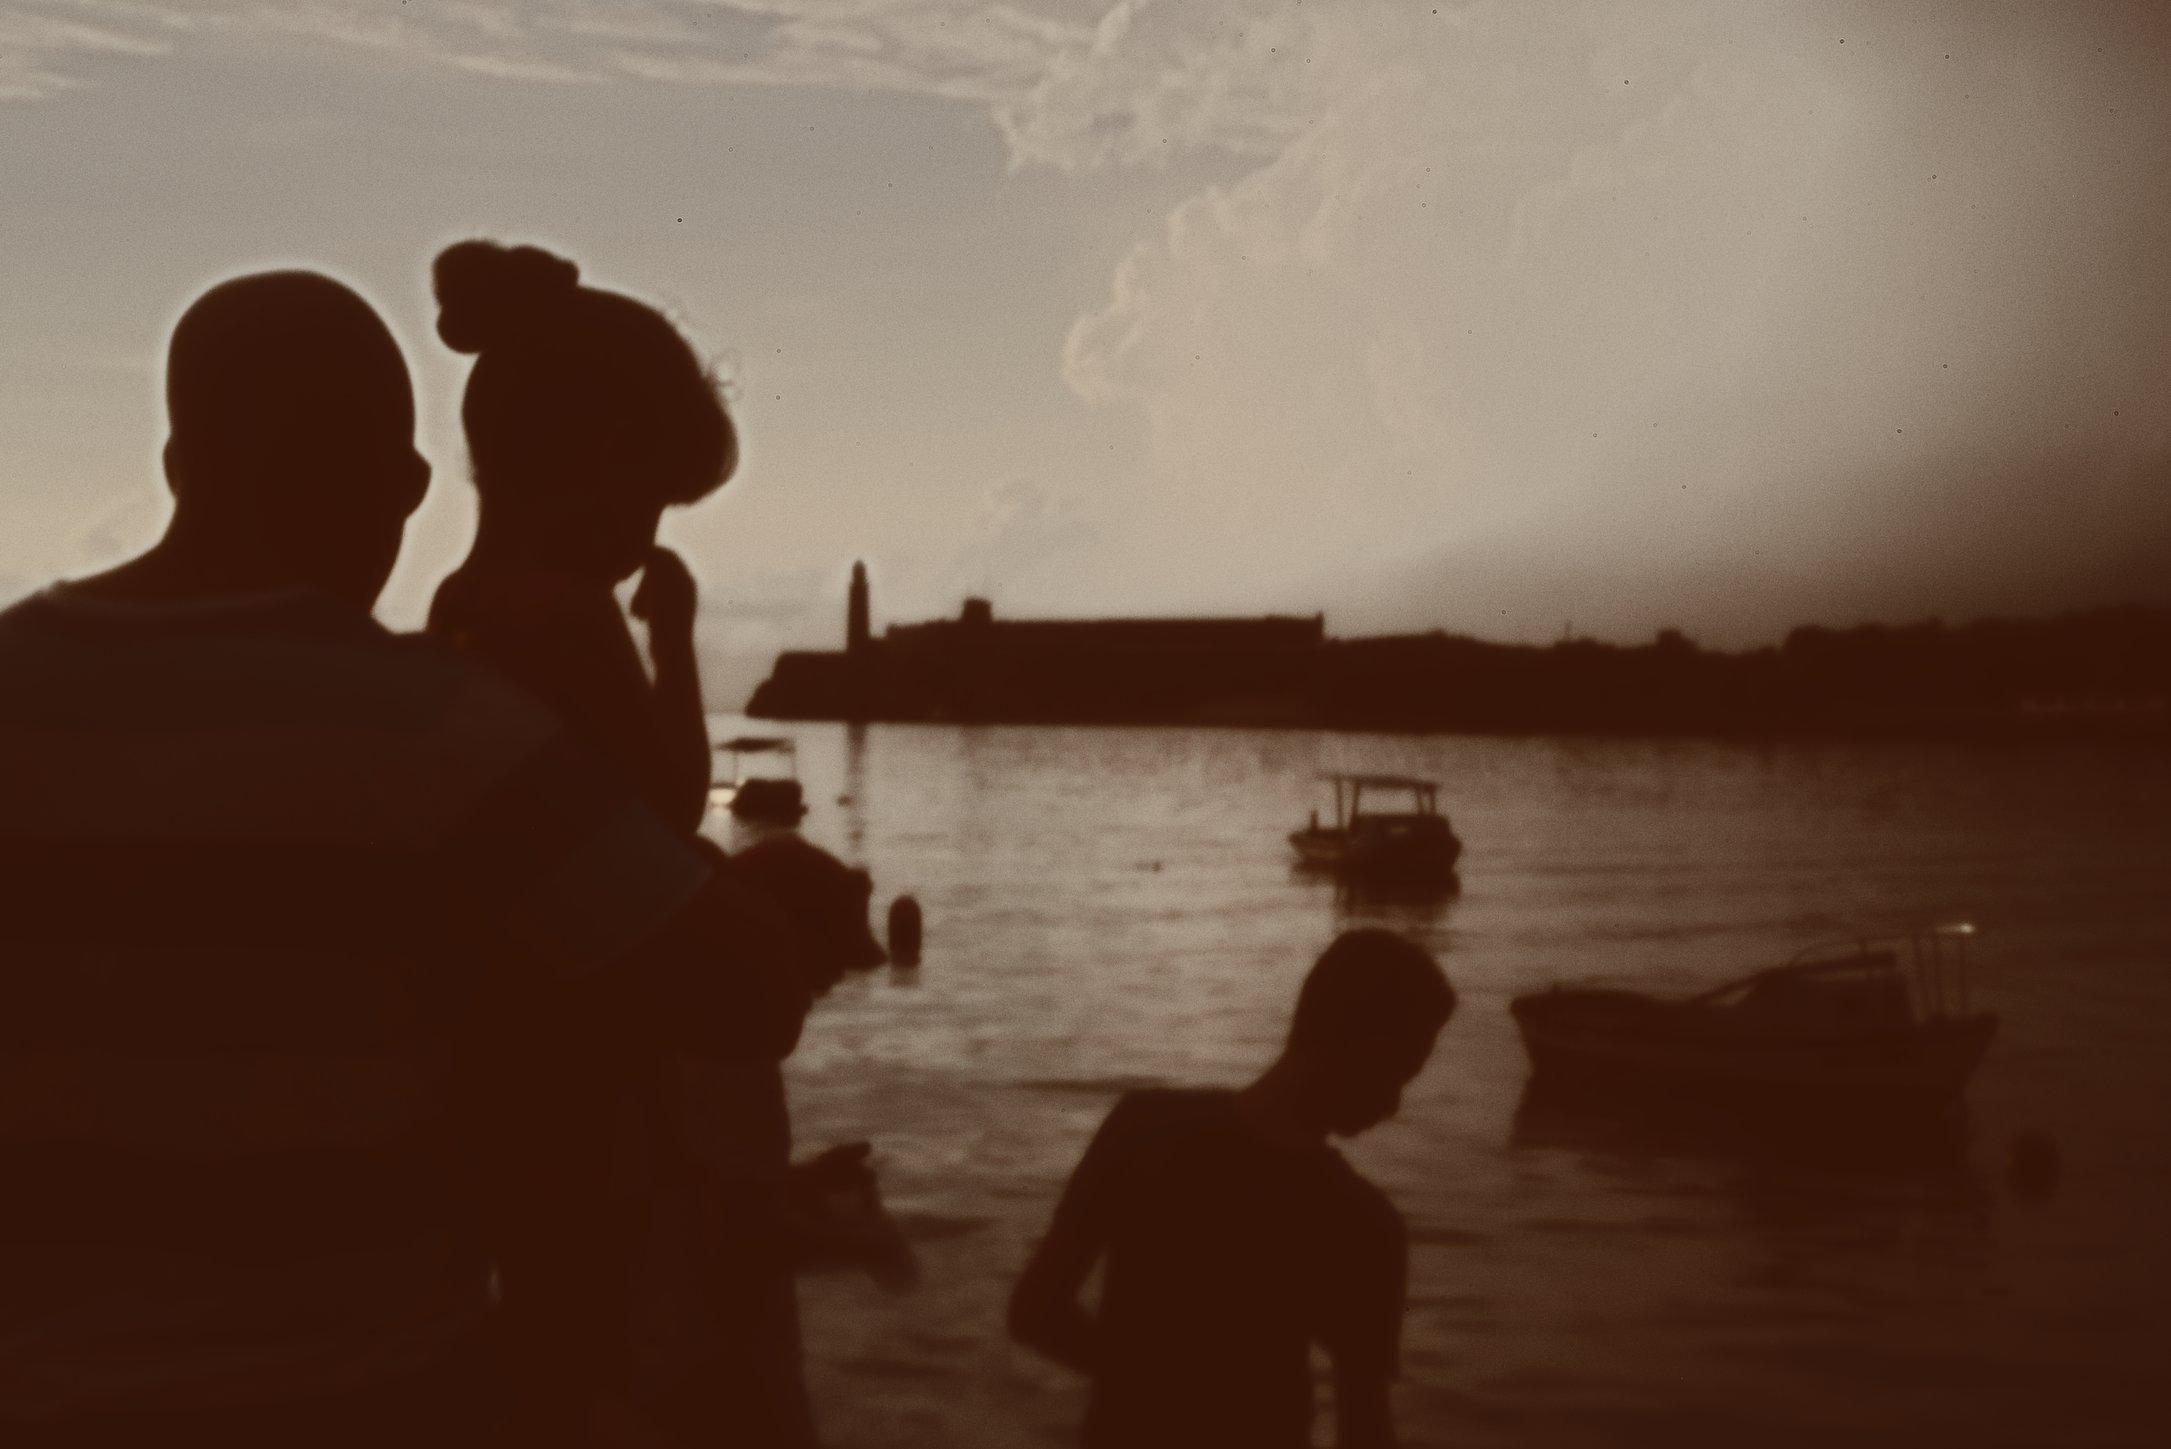 2015 | Ciudad de La Habana [Cuba]